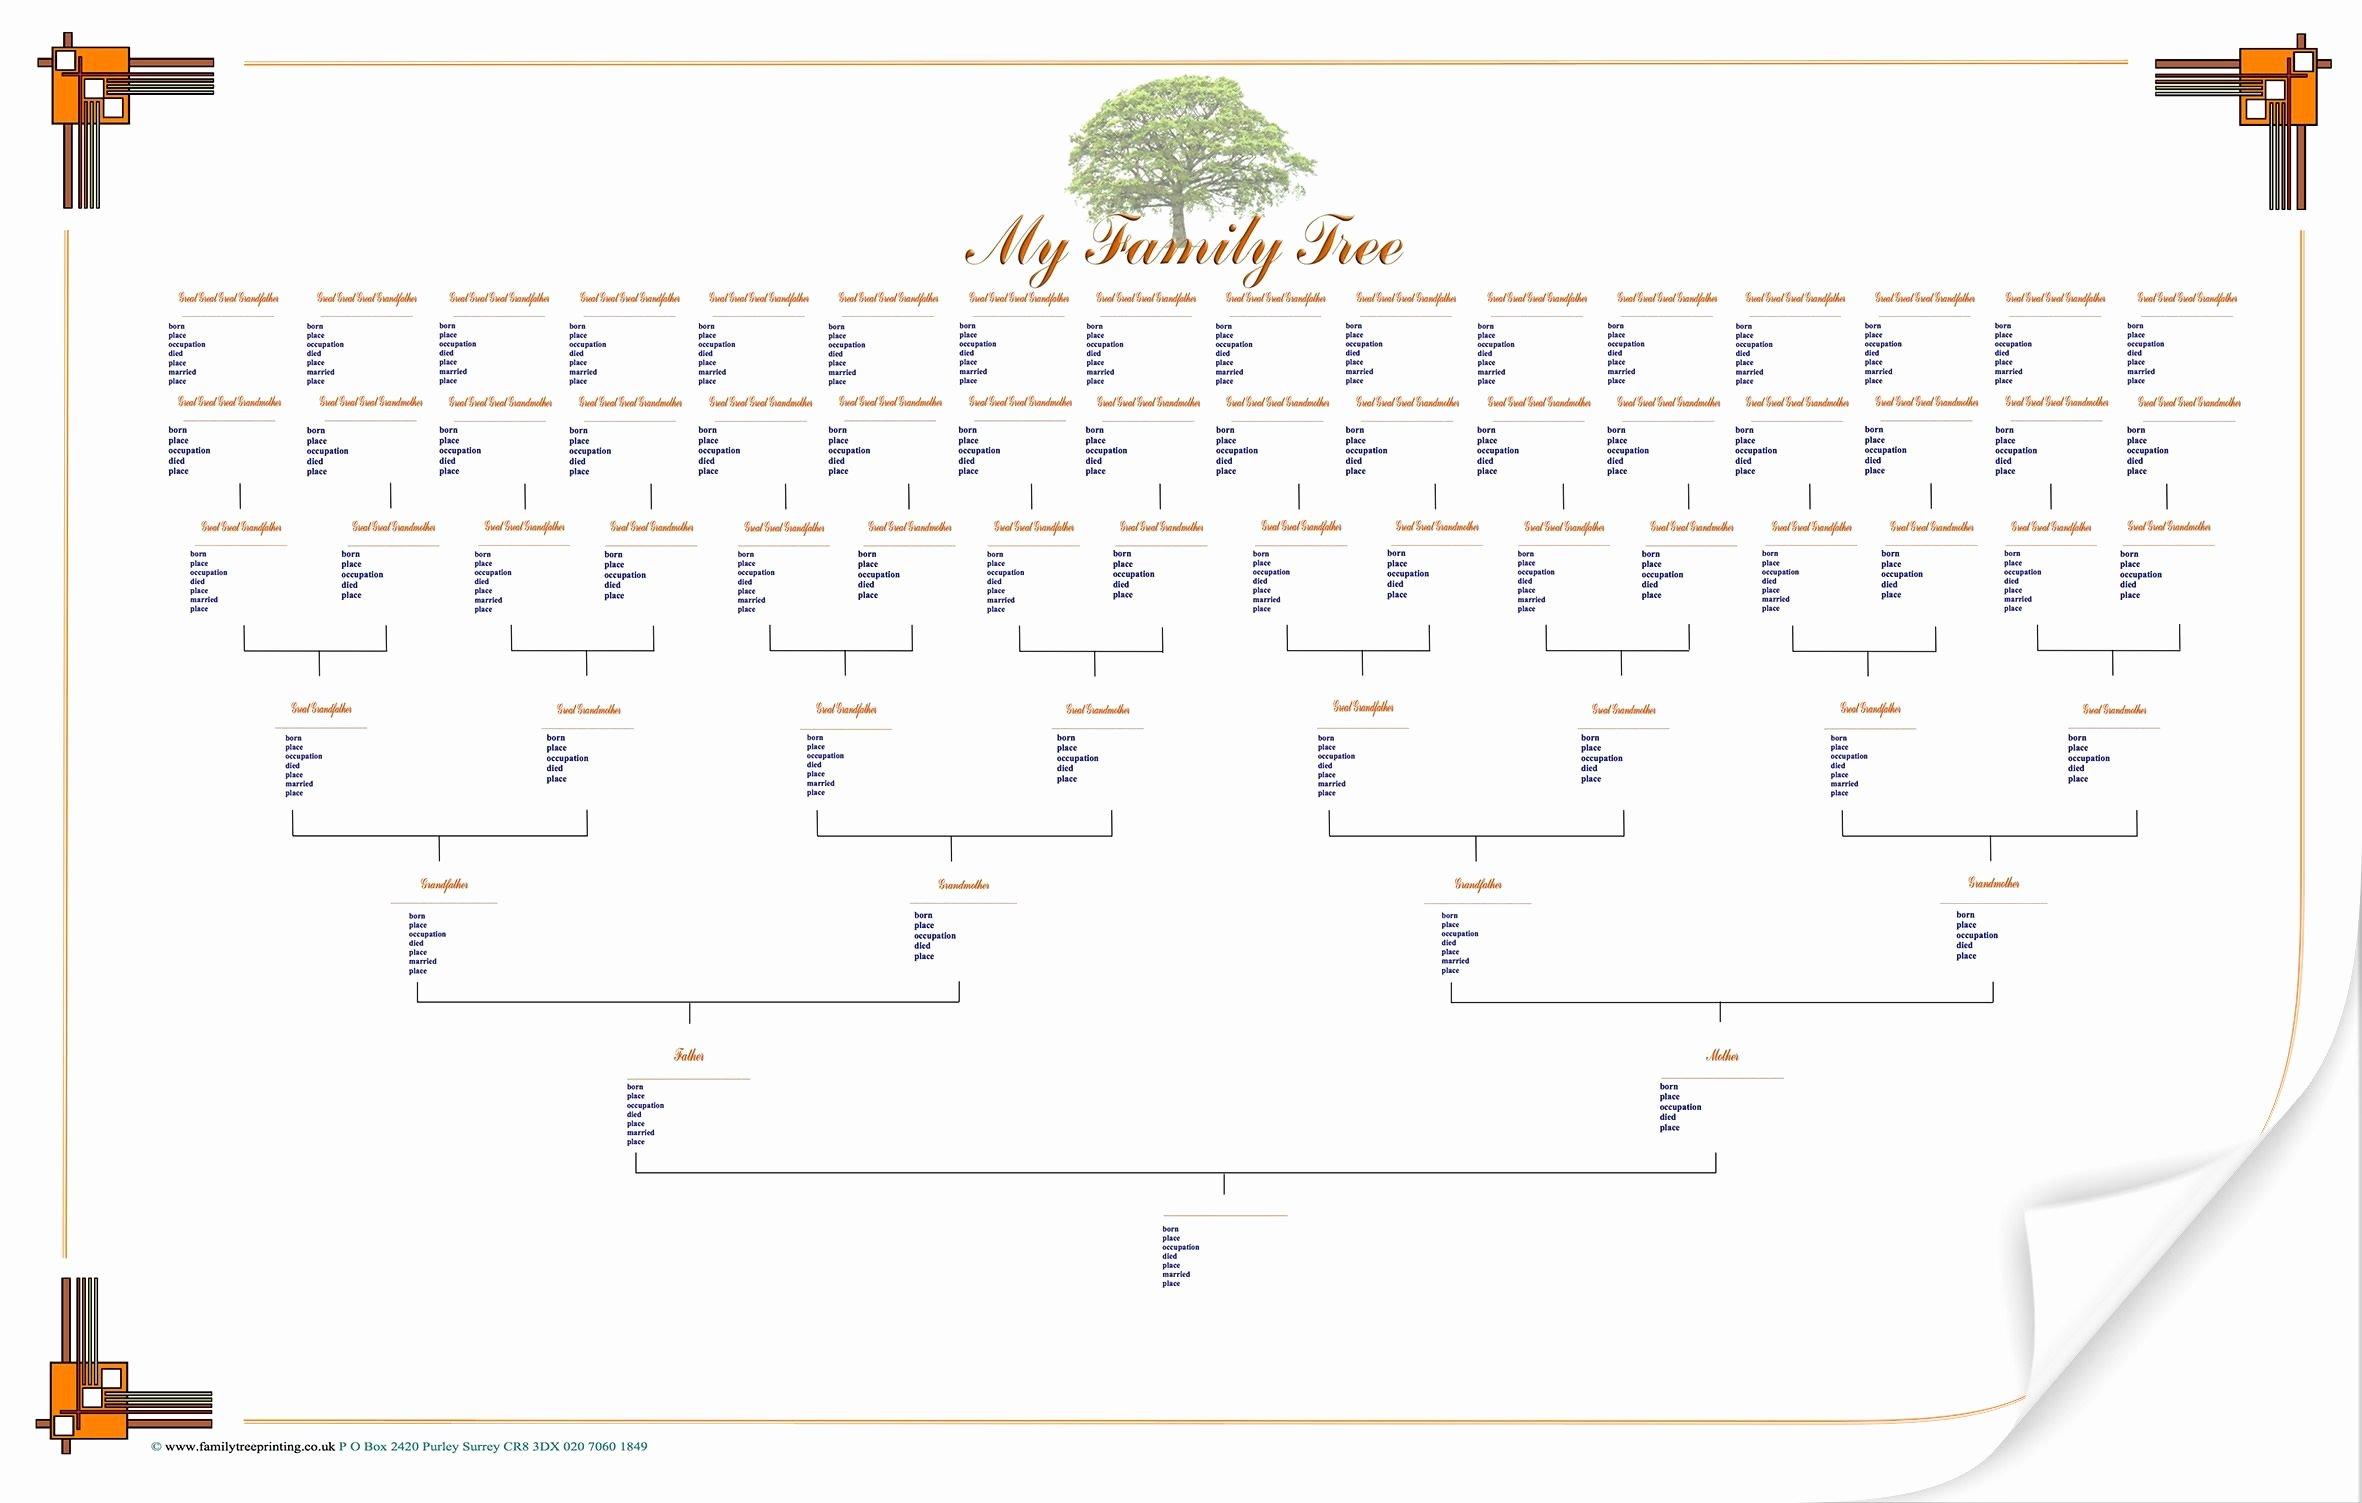 Family Tree Template Free Inspirational Blank Family Tree Chart Geneology